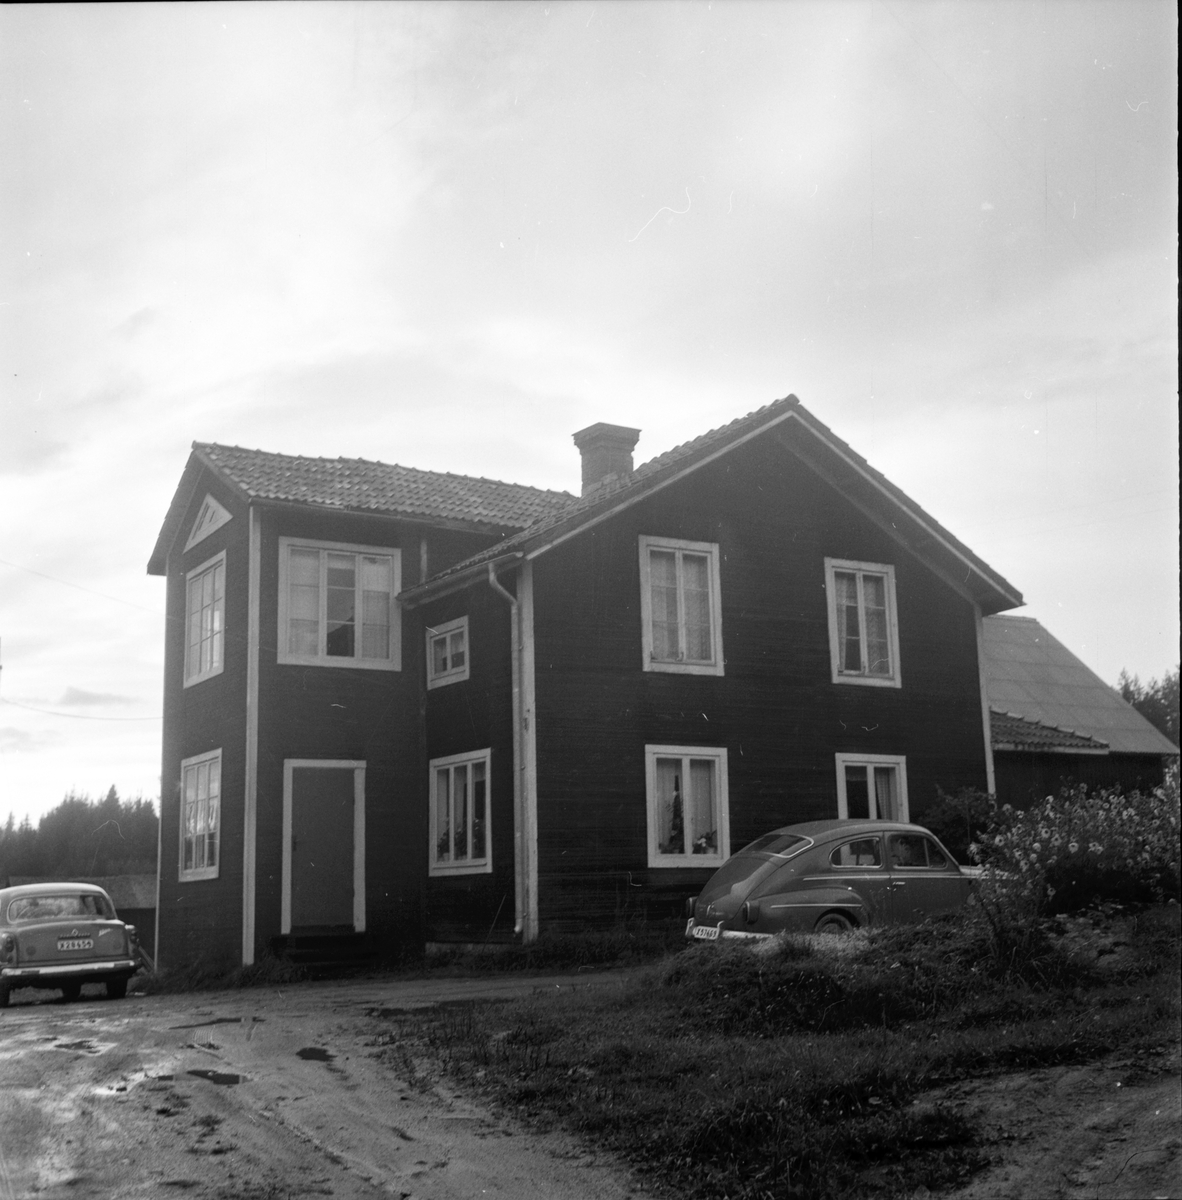 Iste, Jonas Persson, 13 September 1961